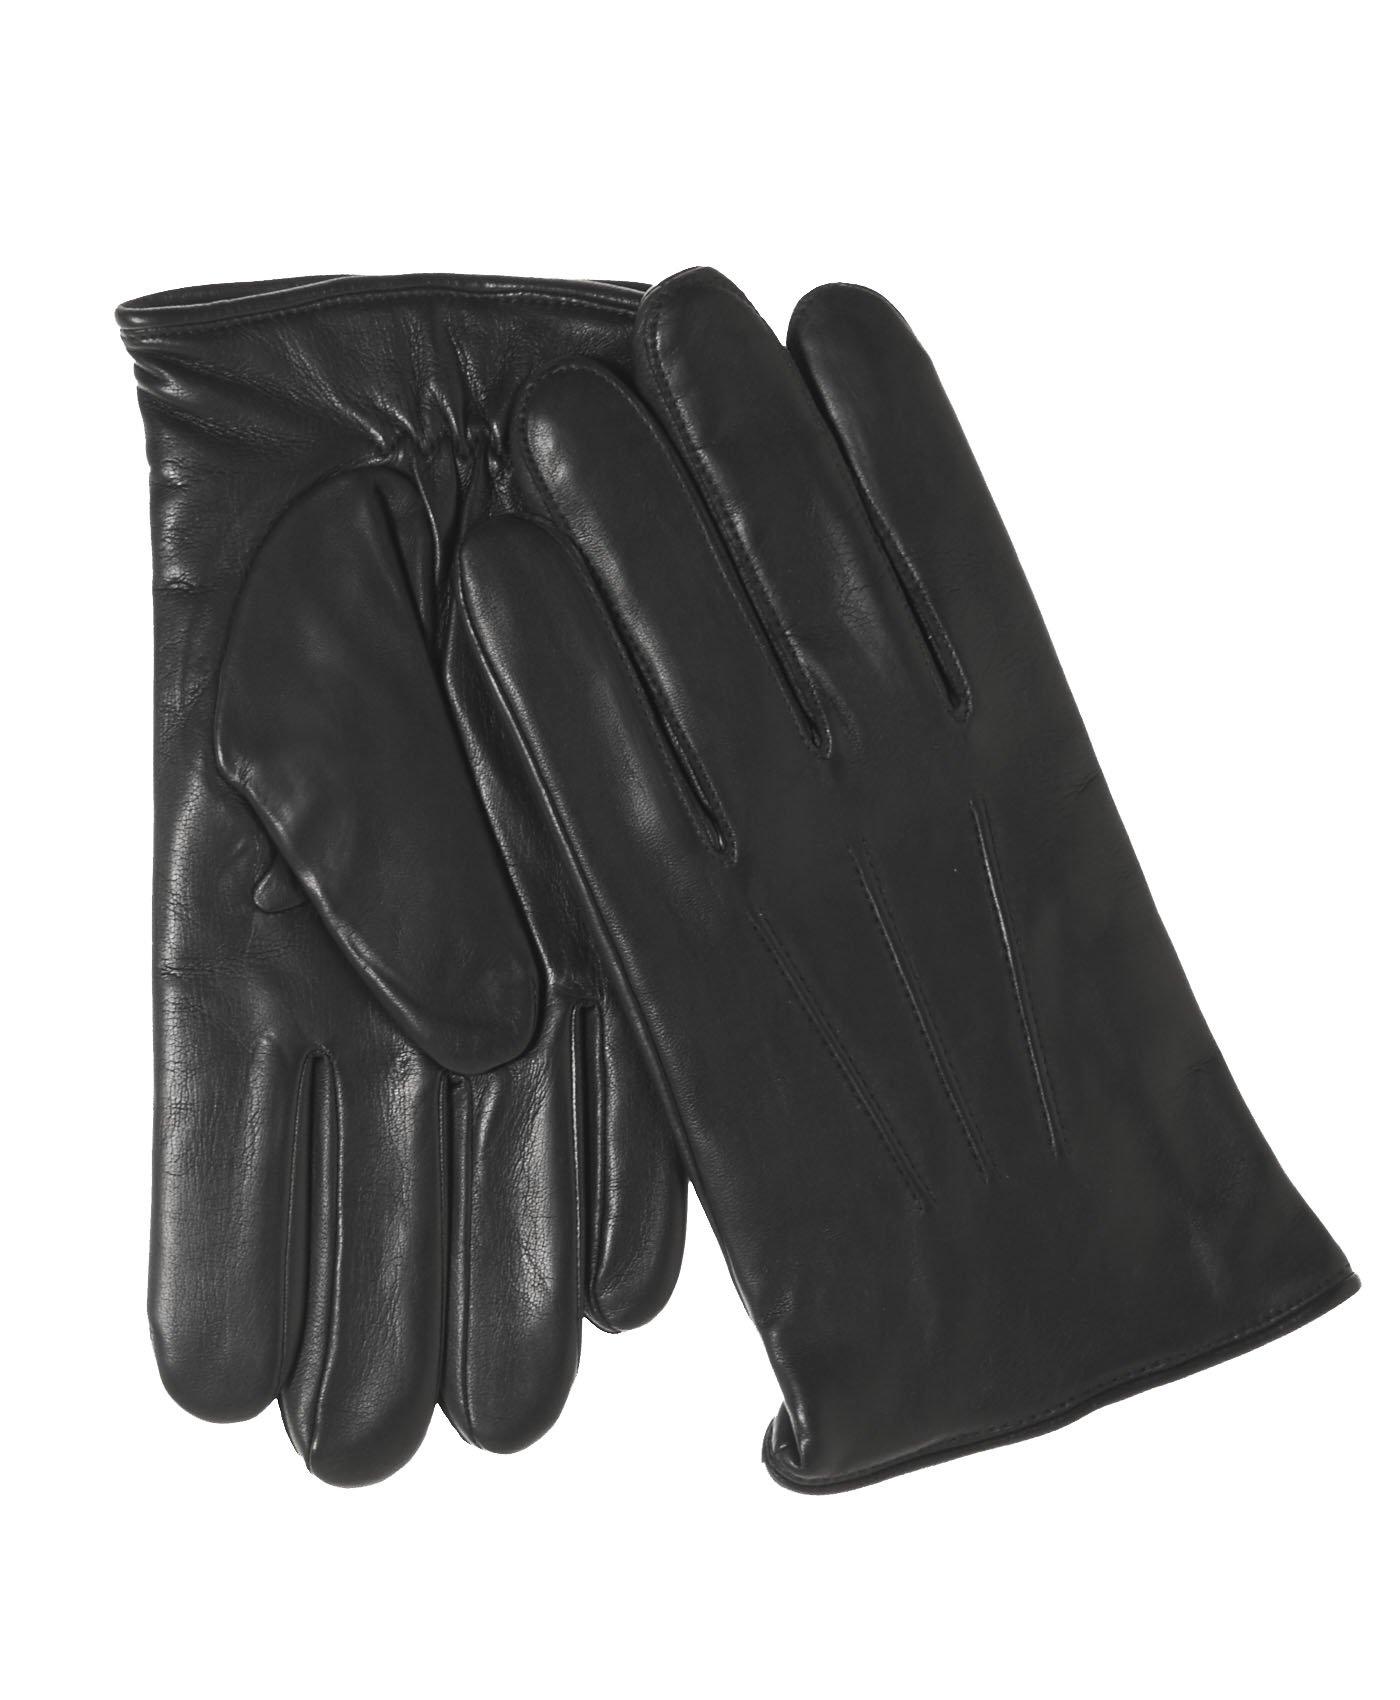 Fratelli Orsini Everyday Men's Italian Lambskin Cashmere Lined Winter Leather Gloves Size XL Color Black